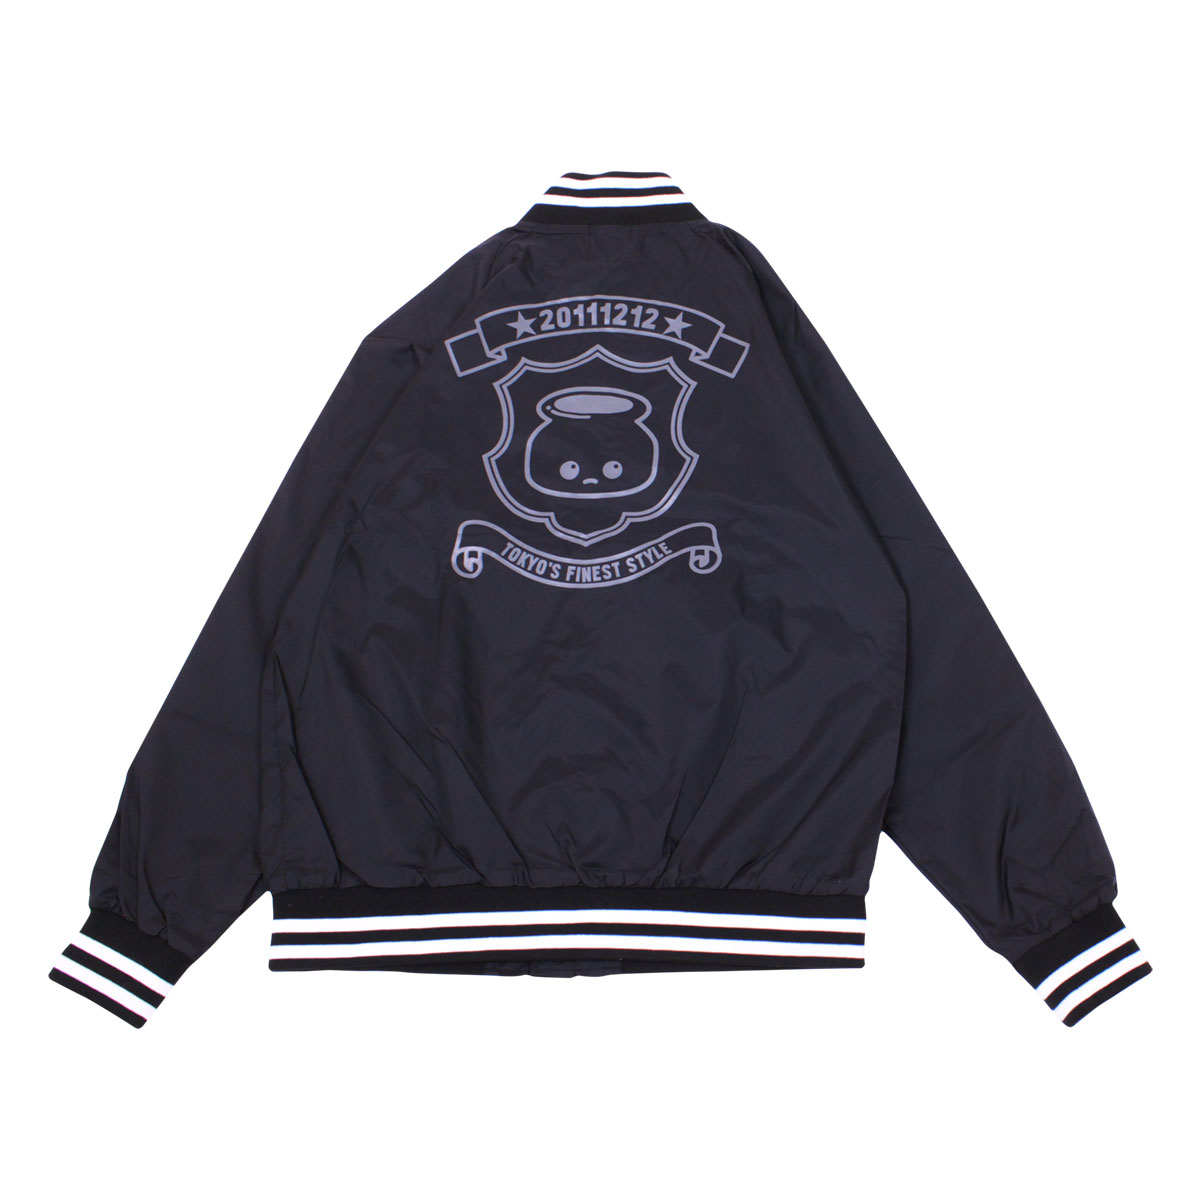 Nylon Stadium Jacket (Black)